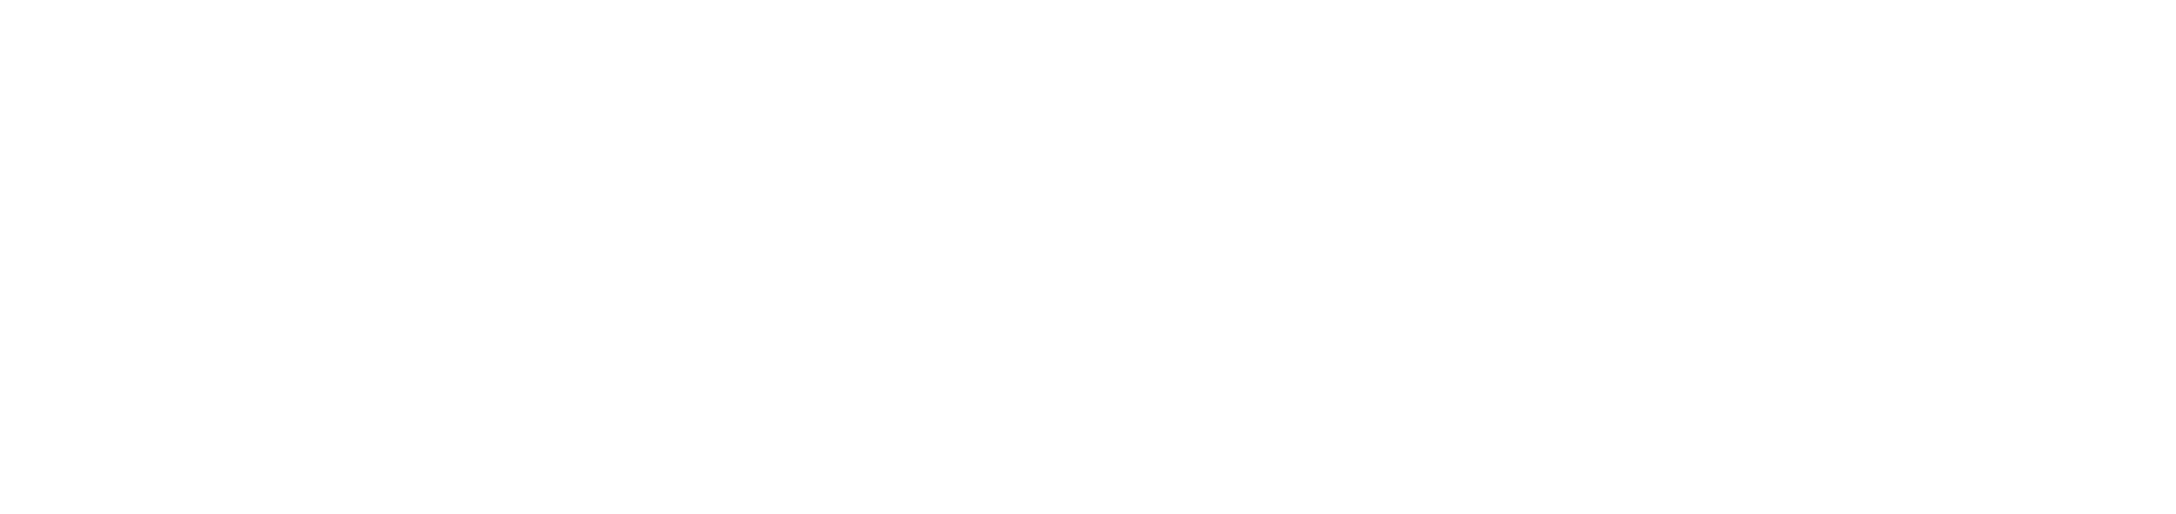 SFReg